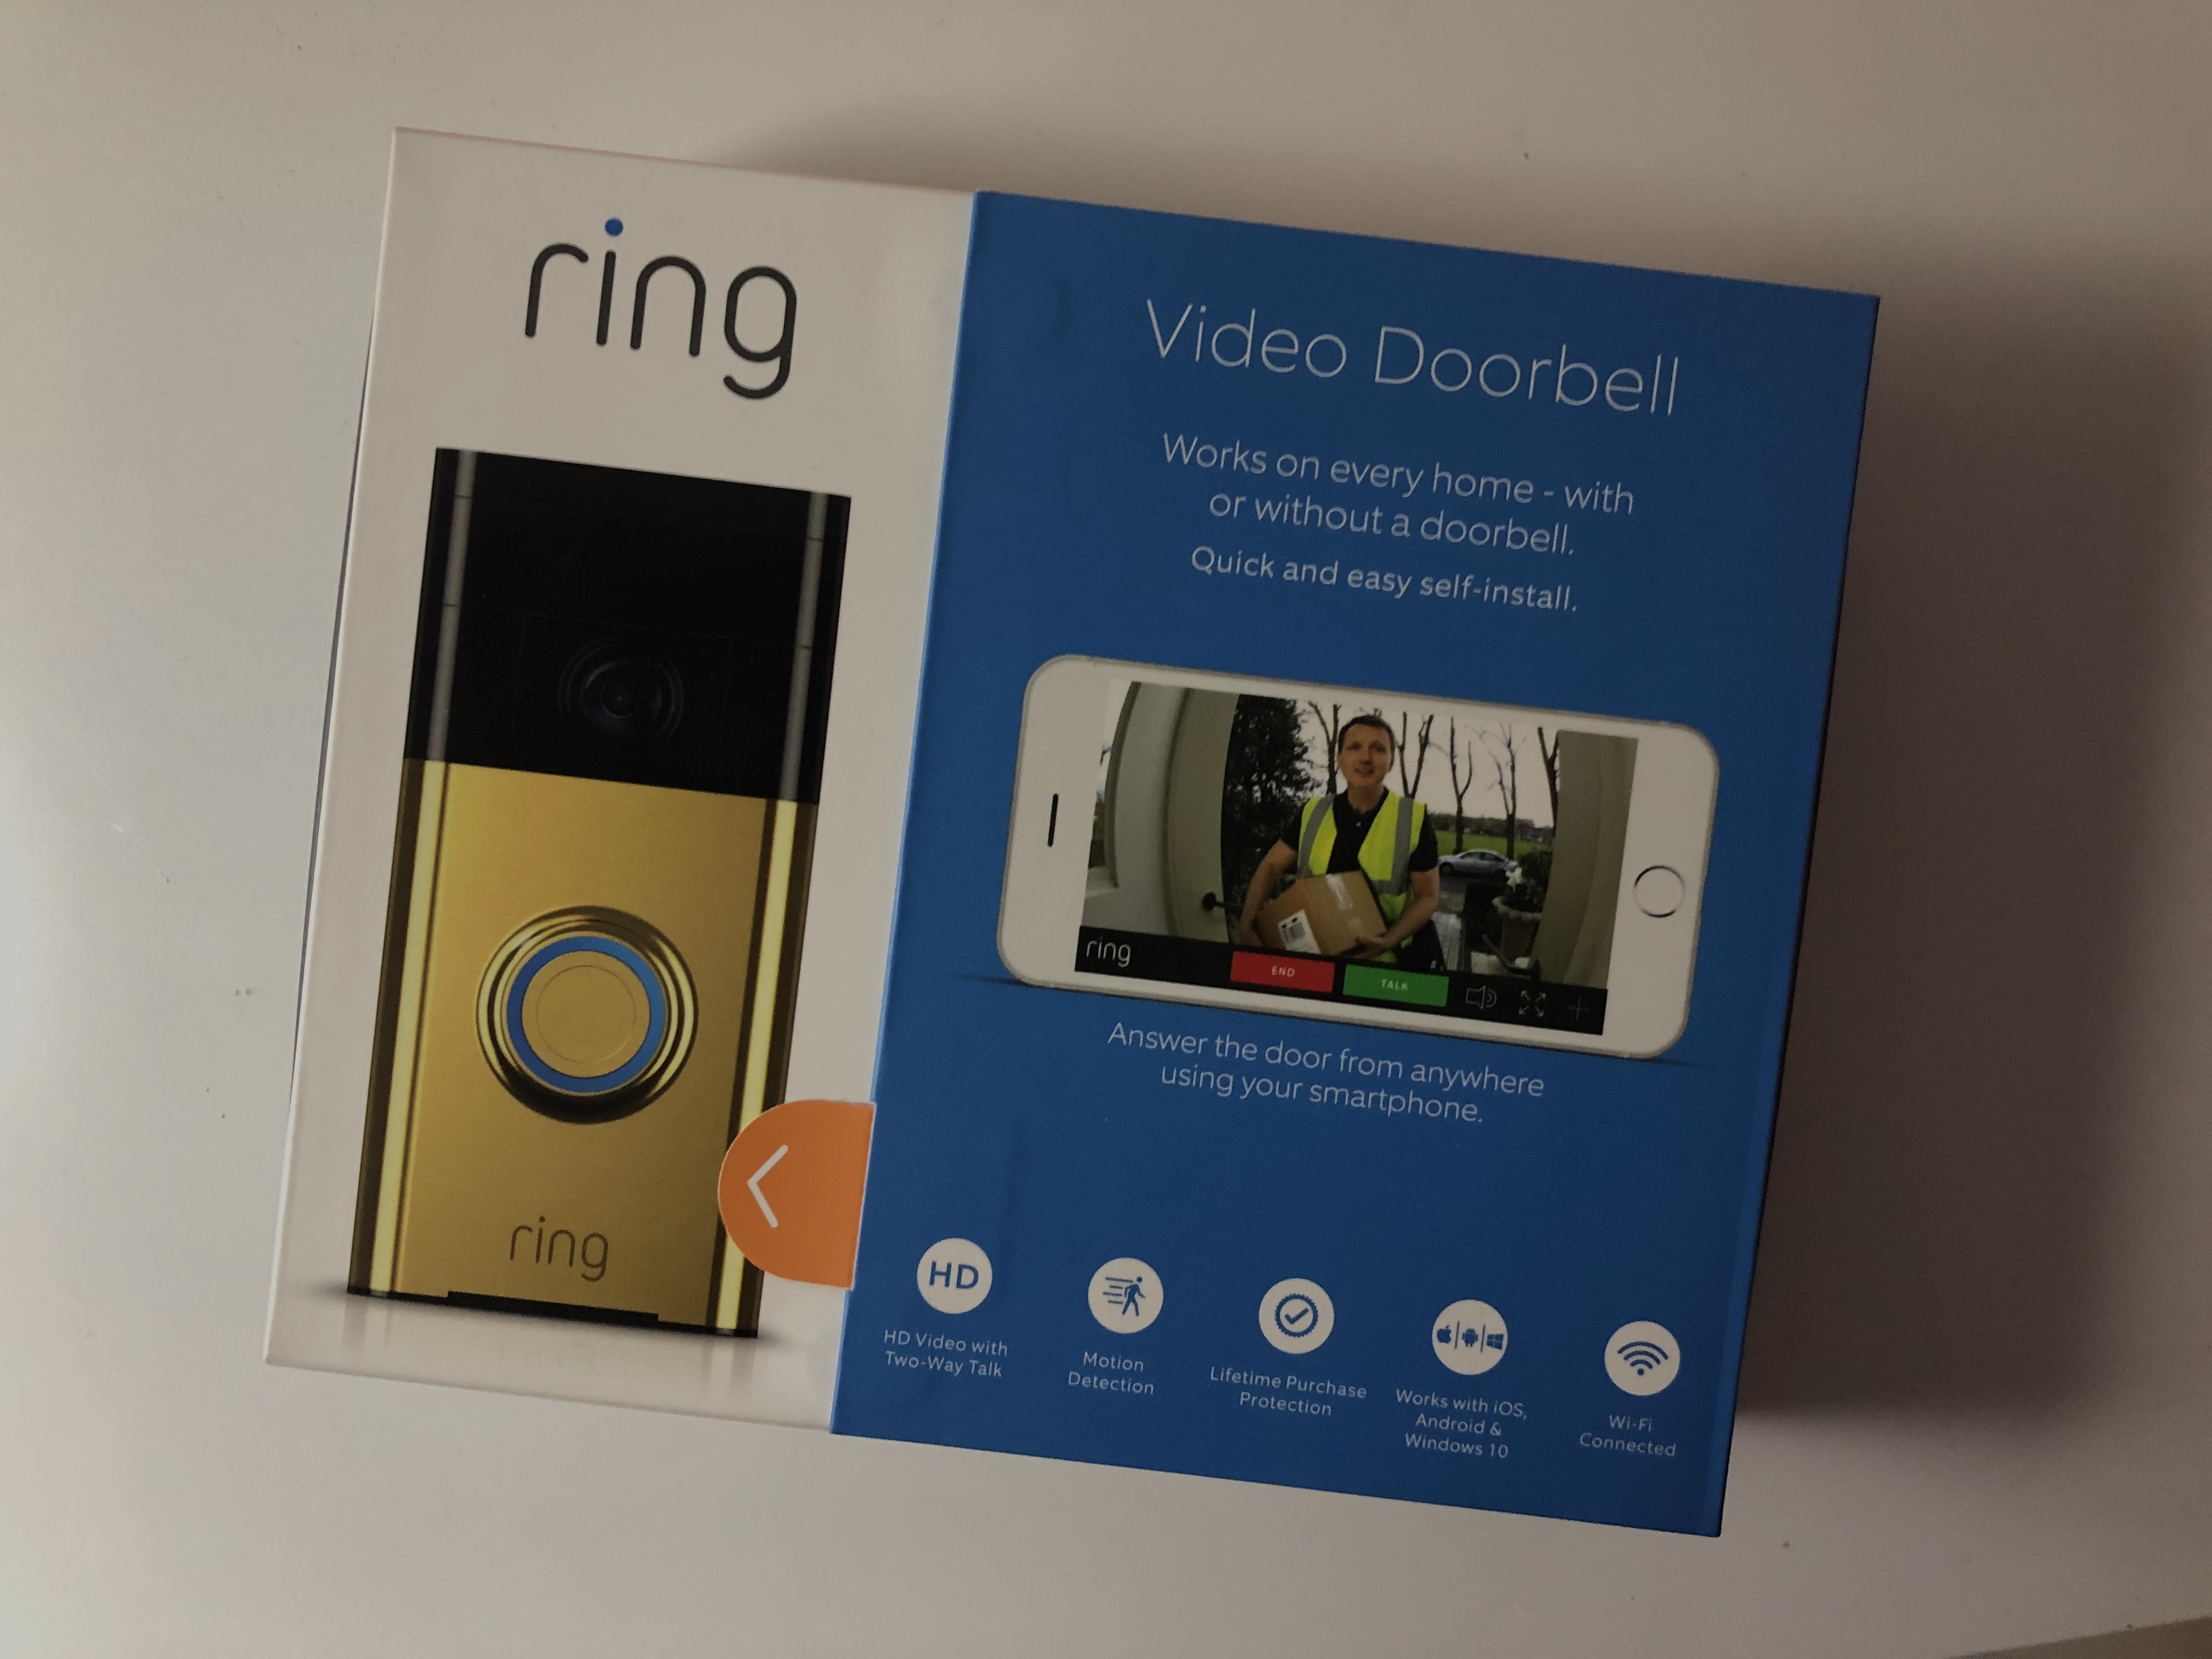 Okoskütyü, okosotthon: Ring Video Doorbell, avagy okos videó kaputelefon